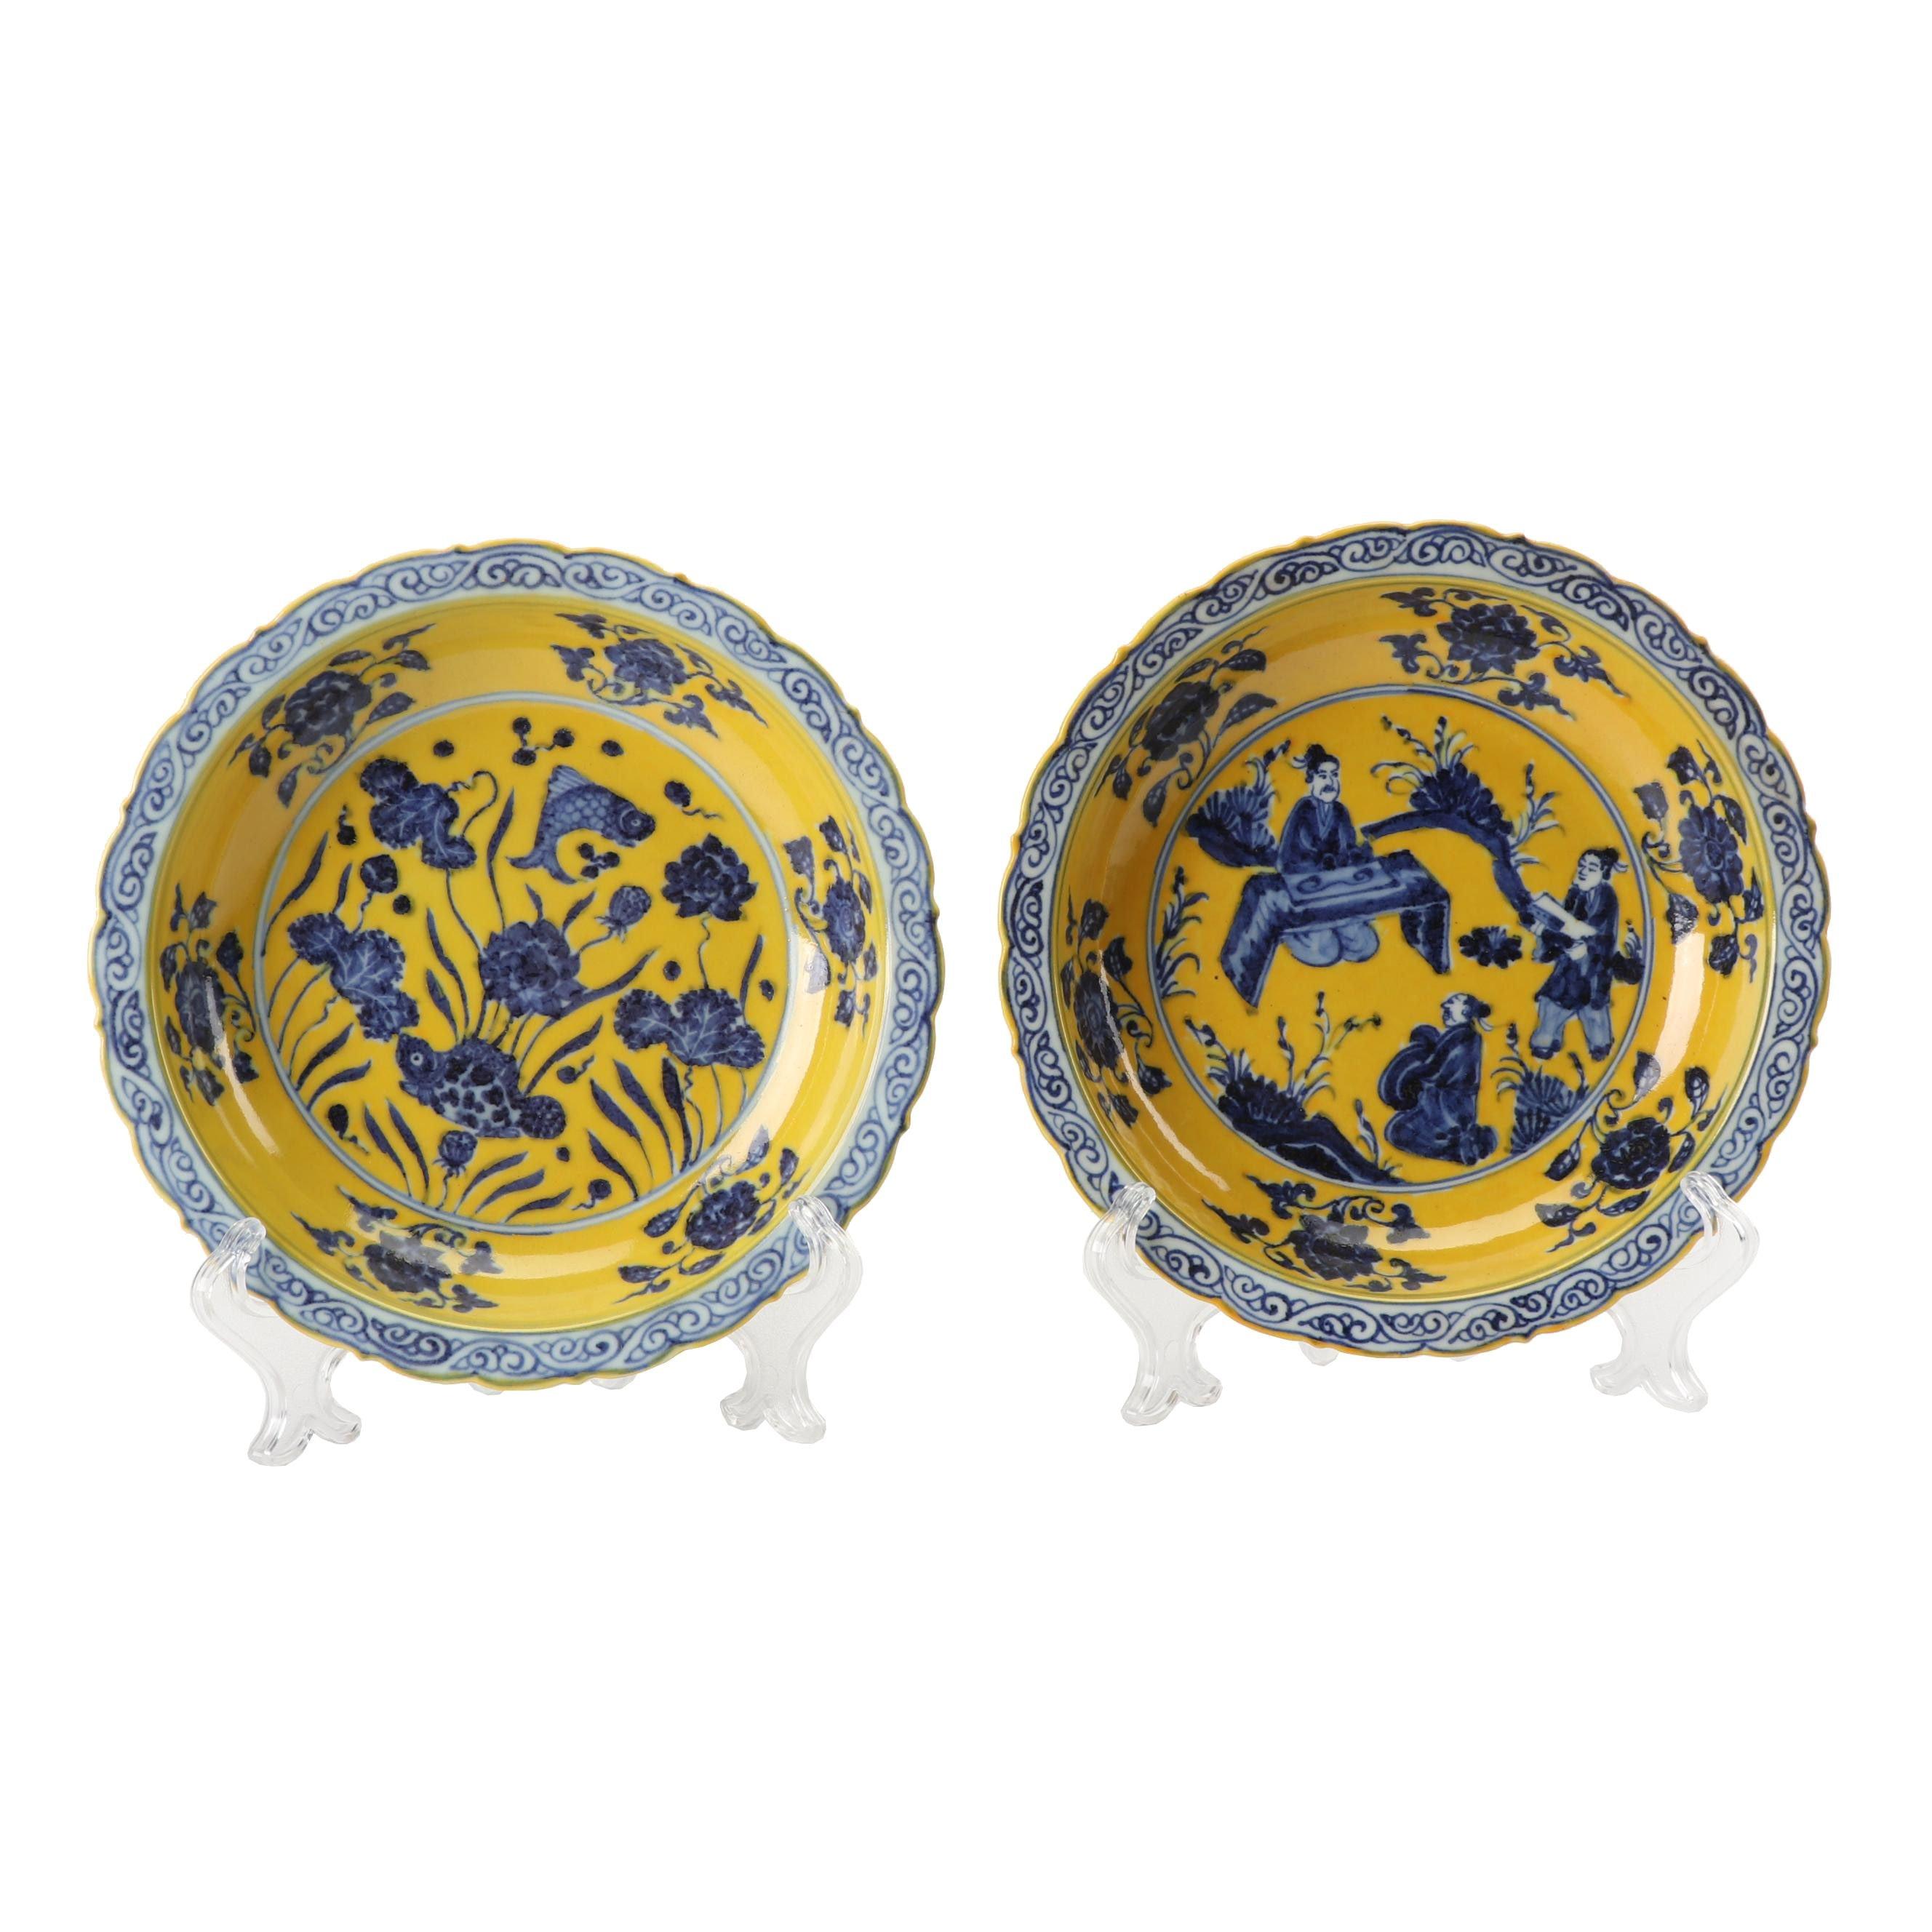 Chinese Famille Jaune Style Porcelain Bowls